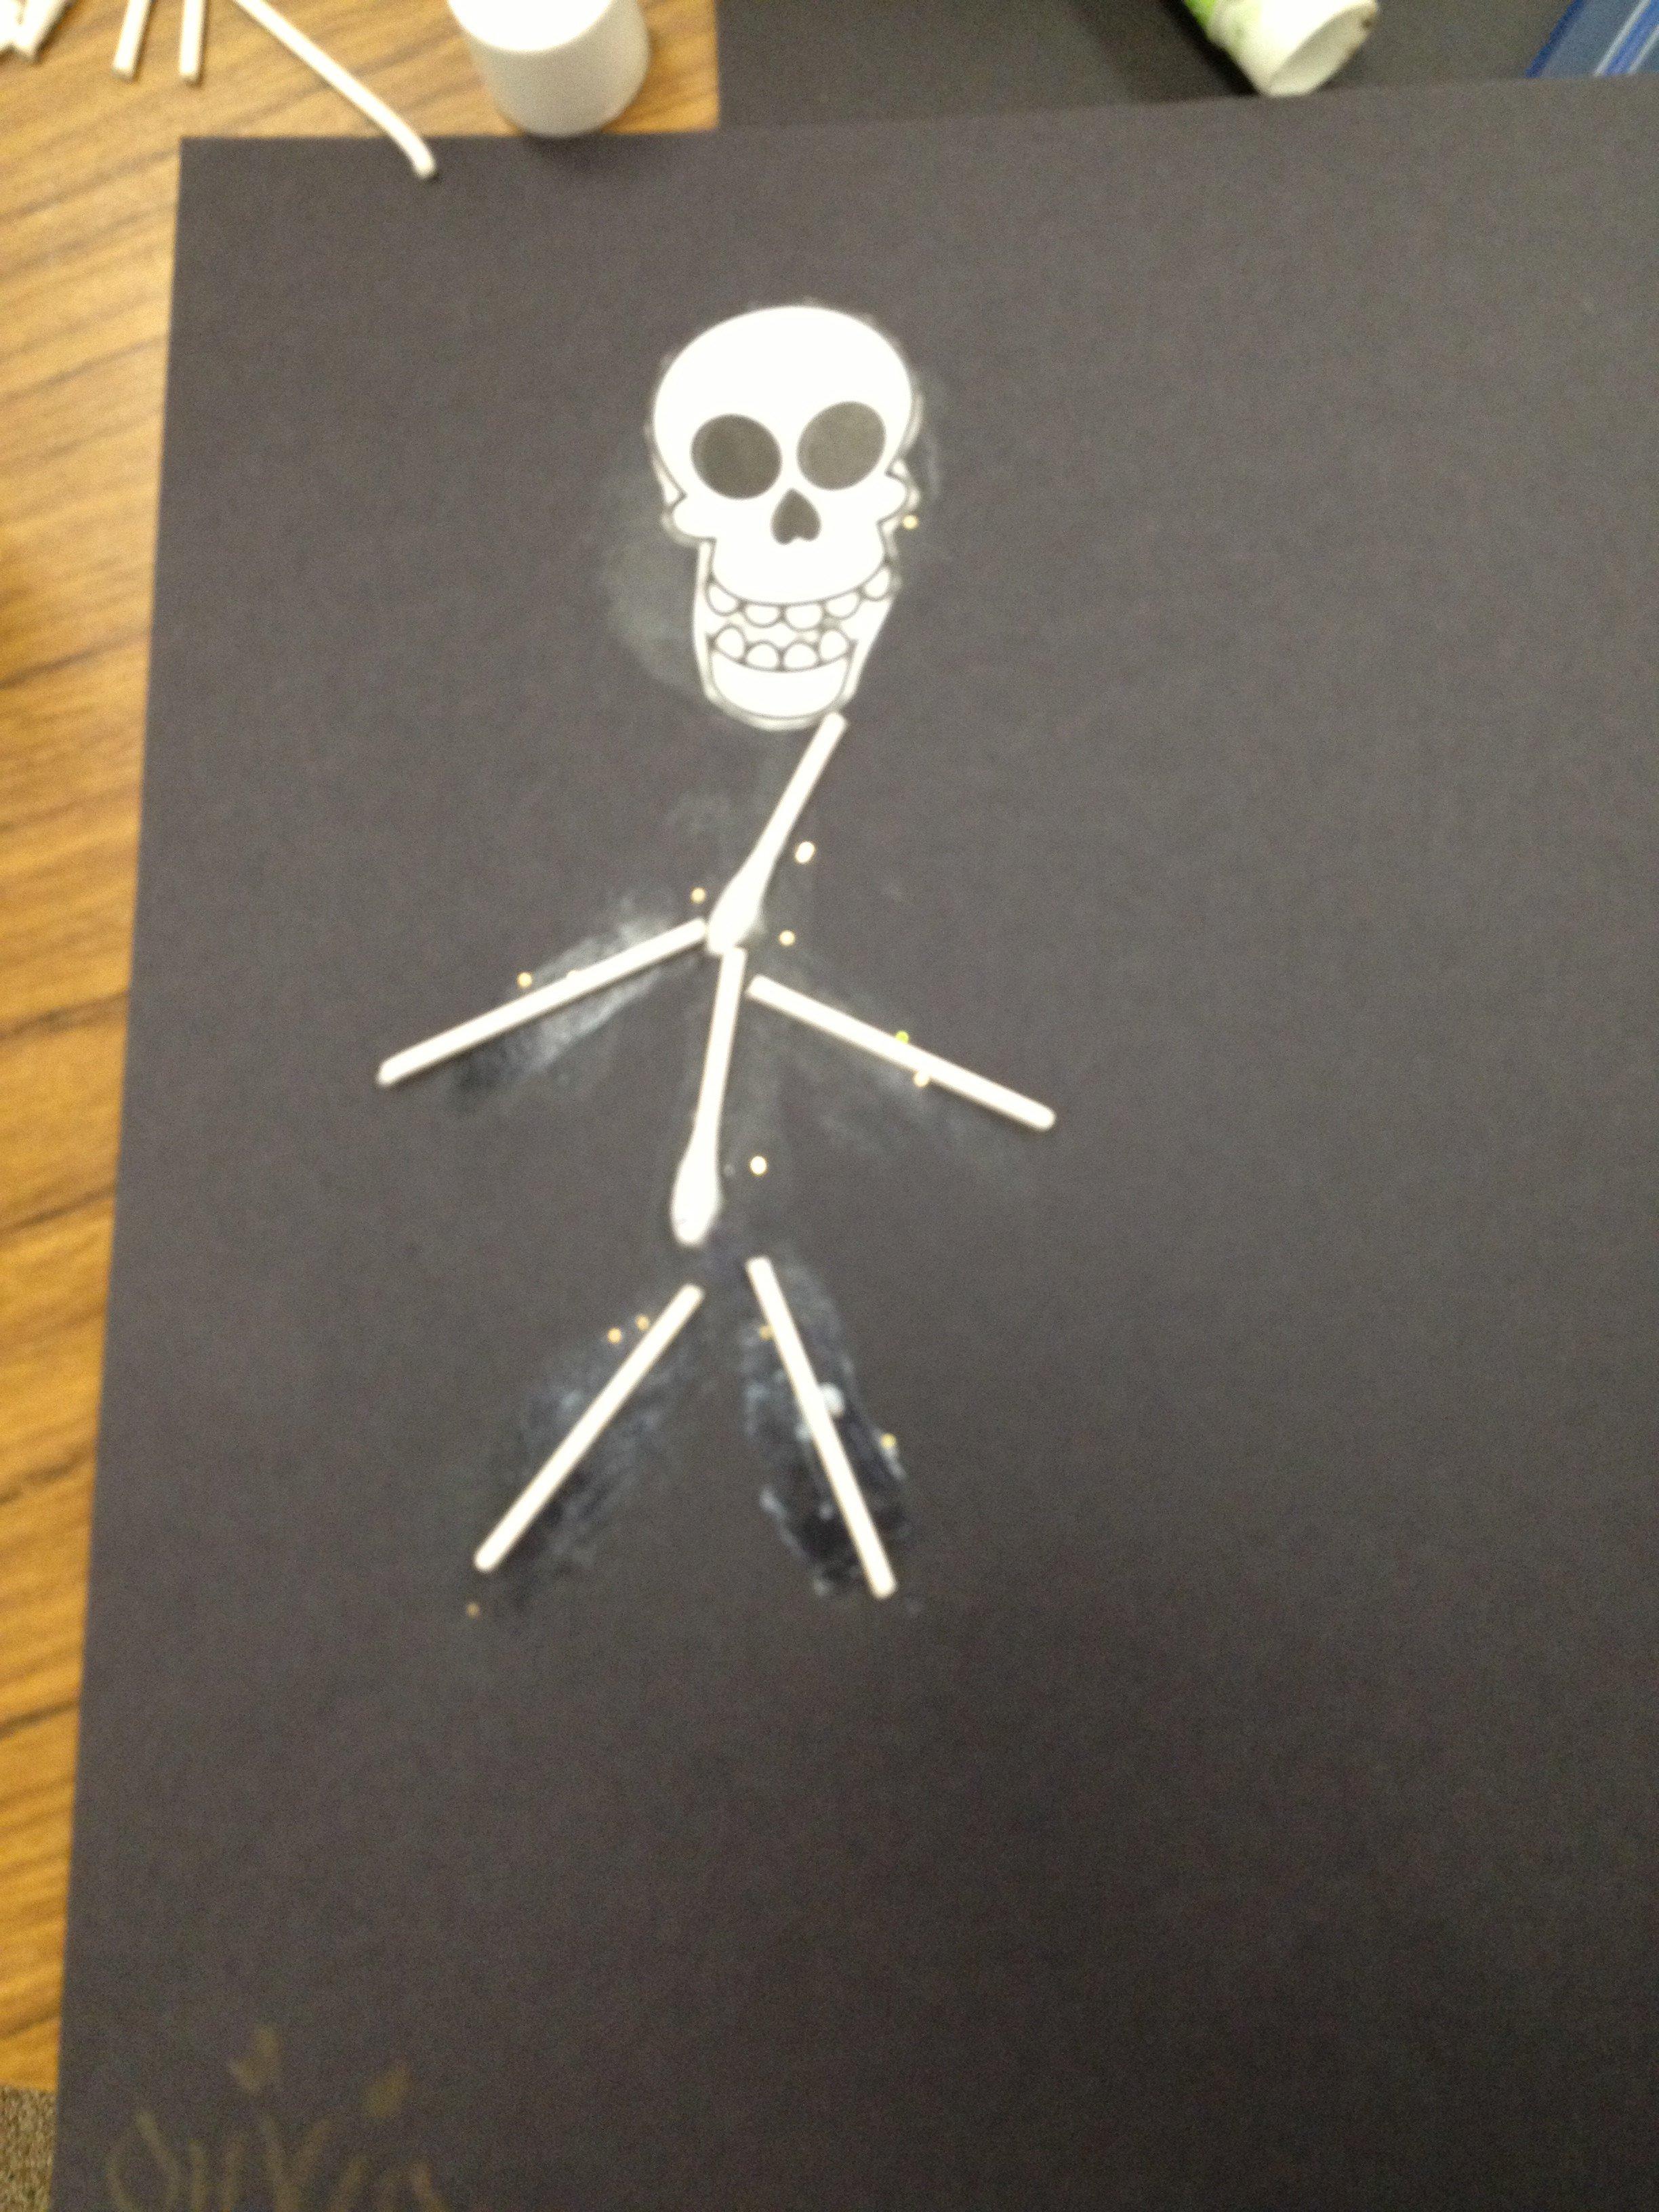 Q Tip Skeleton Head Template Pumpkin Books